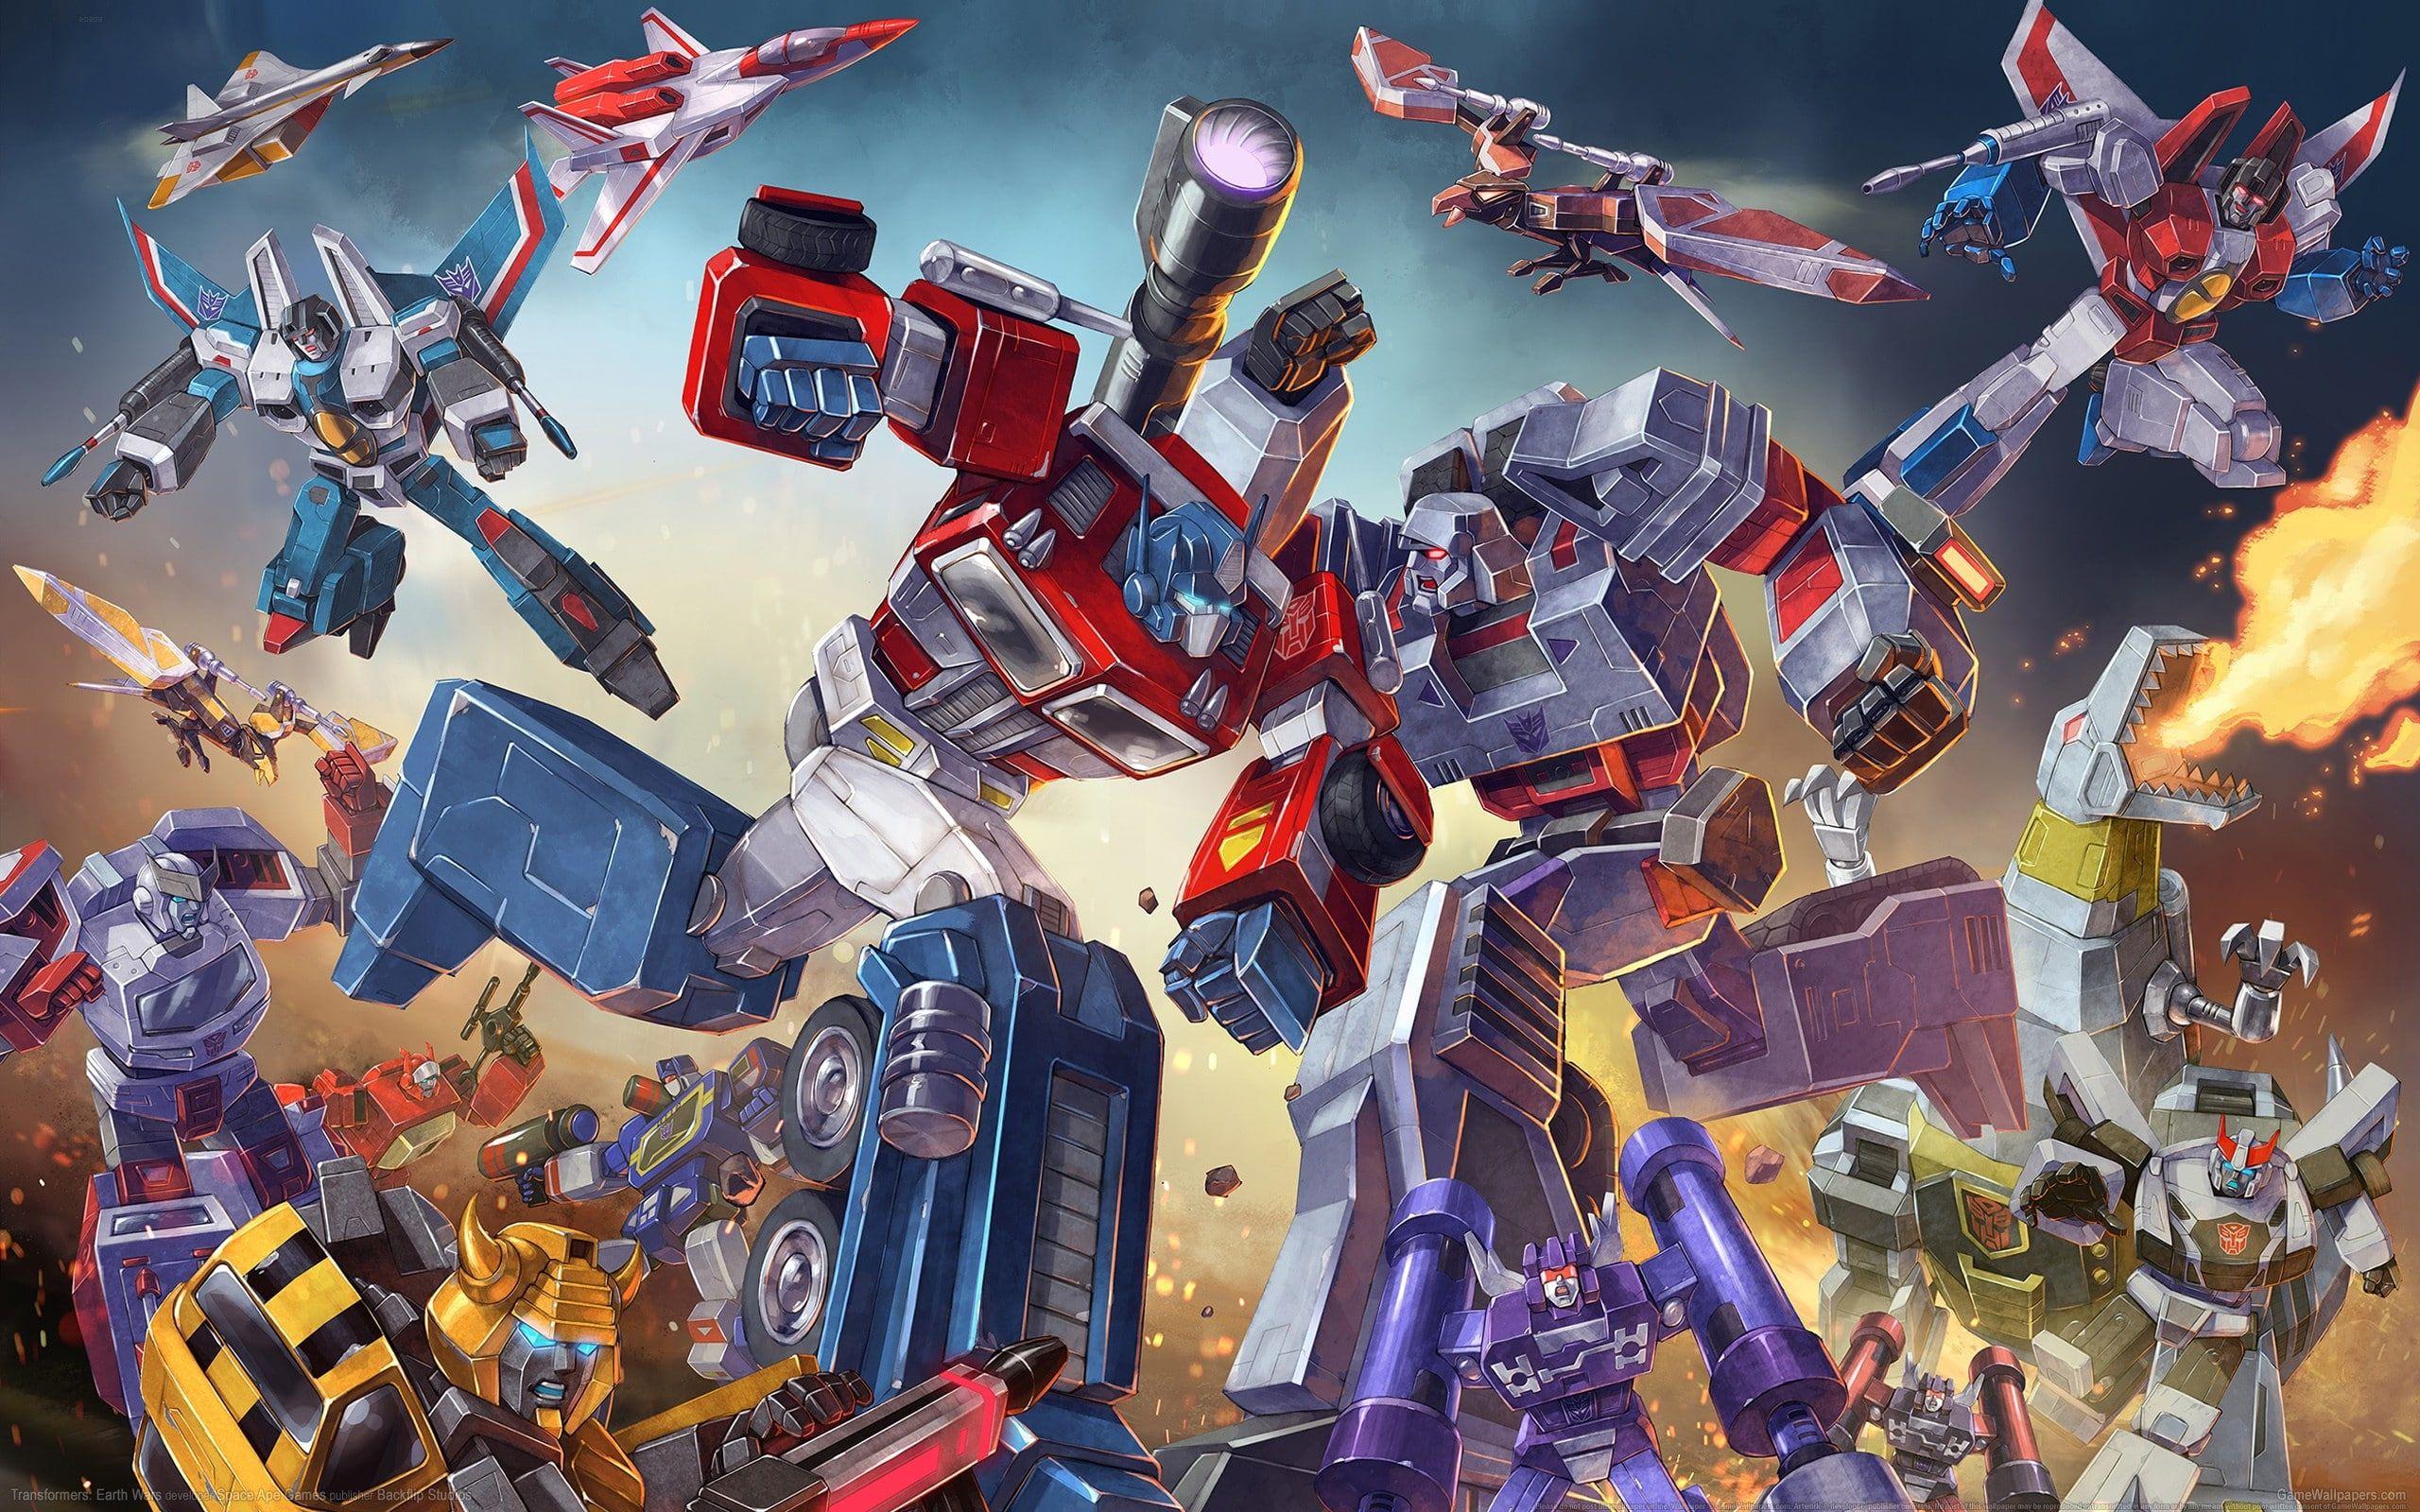 Transformers G1 Optimus Prime Bumblebee Megatron Battle 2k Wallpaper Hdwallpaper Desktop Transformers Hd Wallpaper 8k Wallpaper